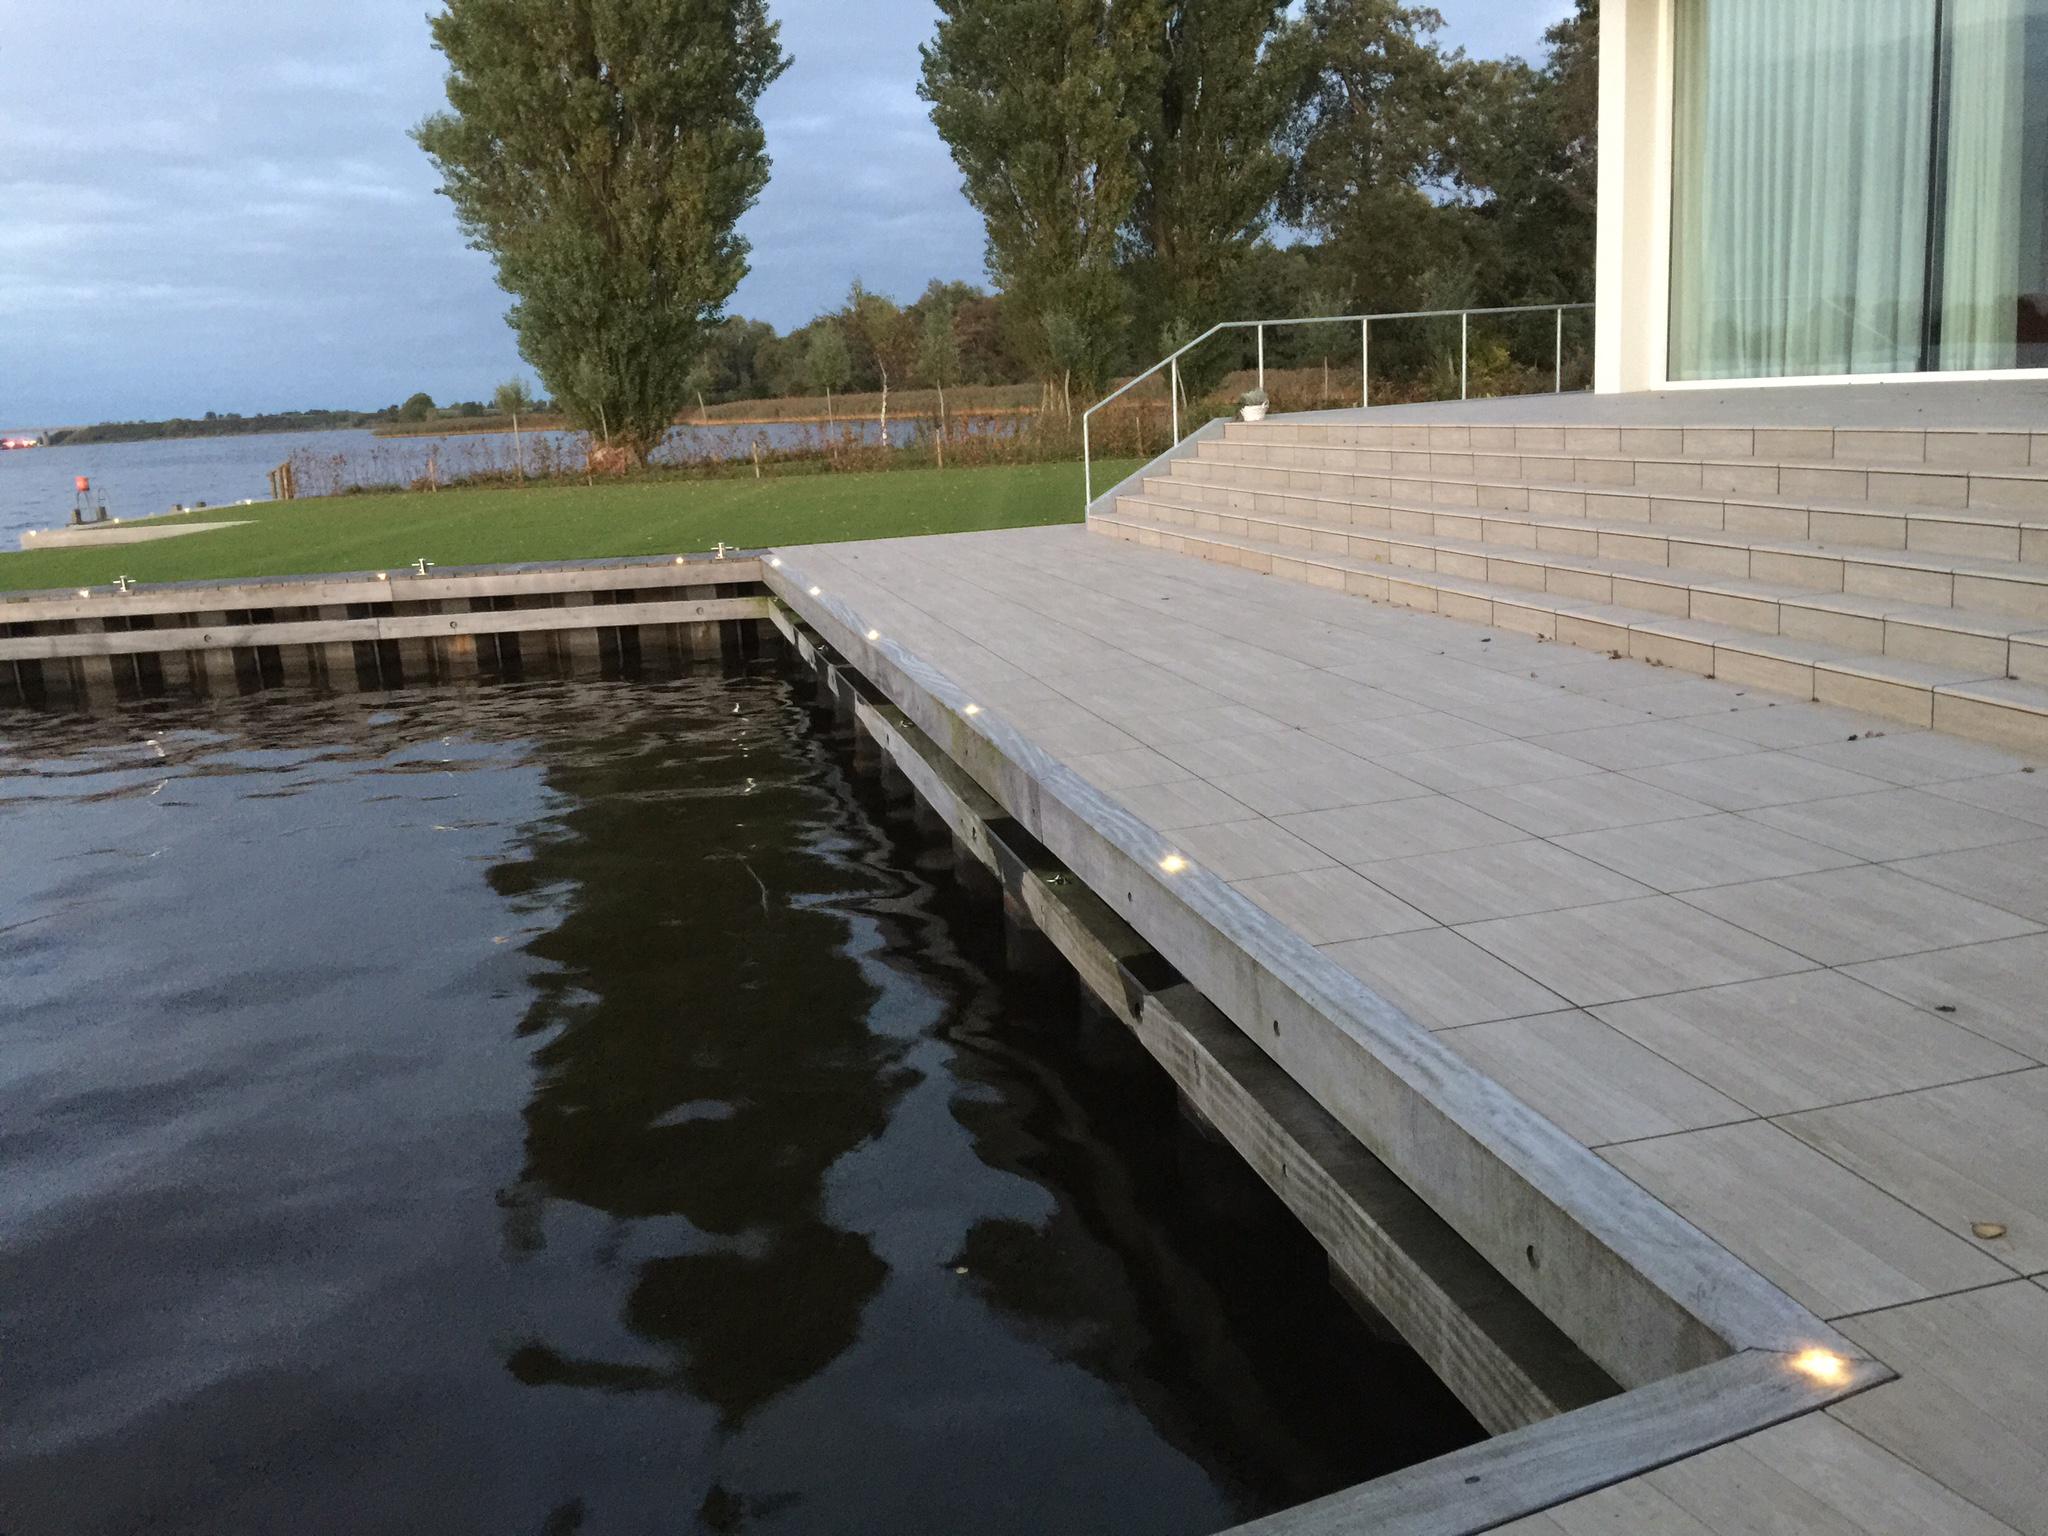 vakantiewoning Friesland - Paul Rattink Verlichting